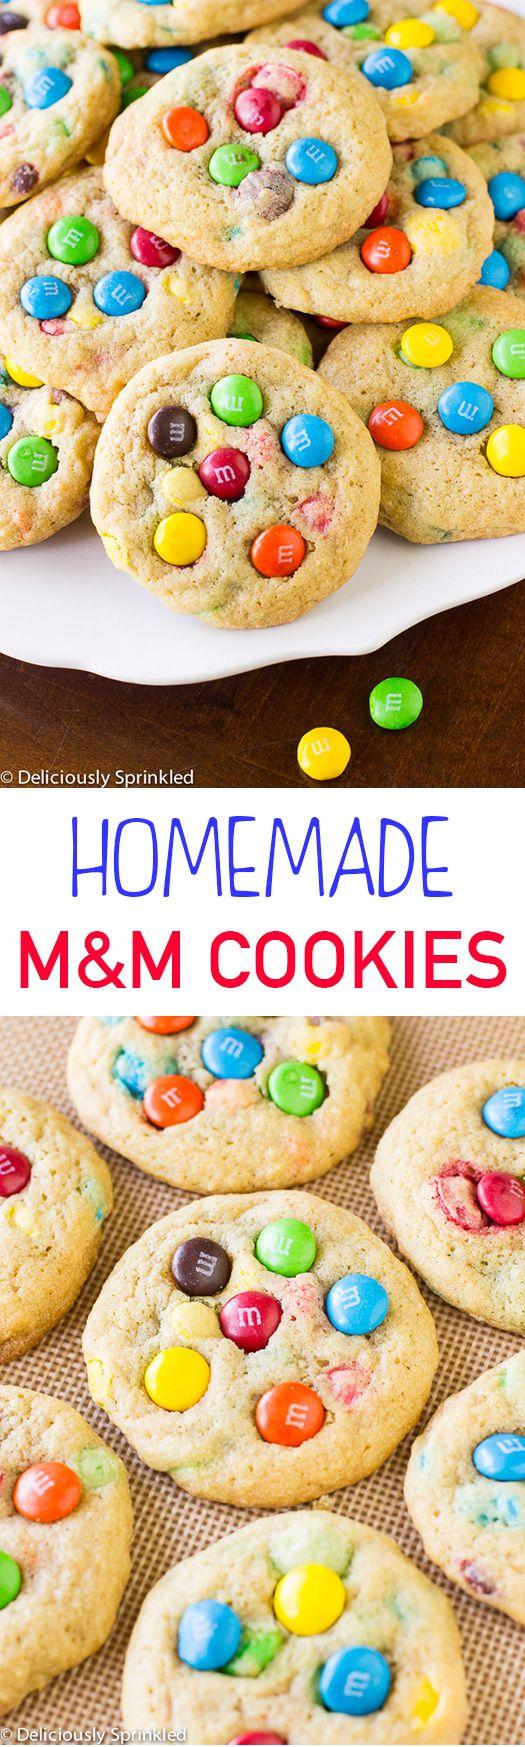 BEST HOMEMADE M&M COOKIES RECIPE